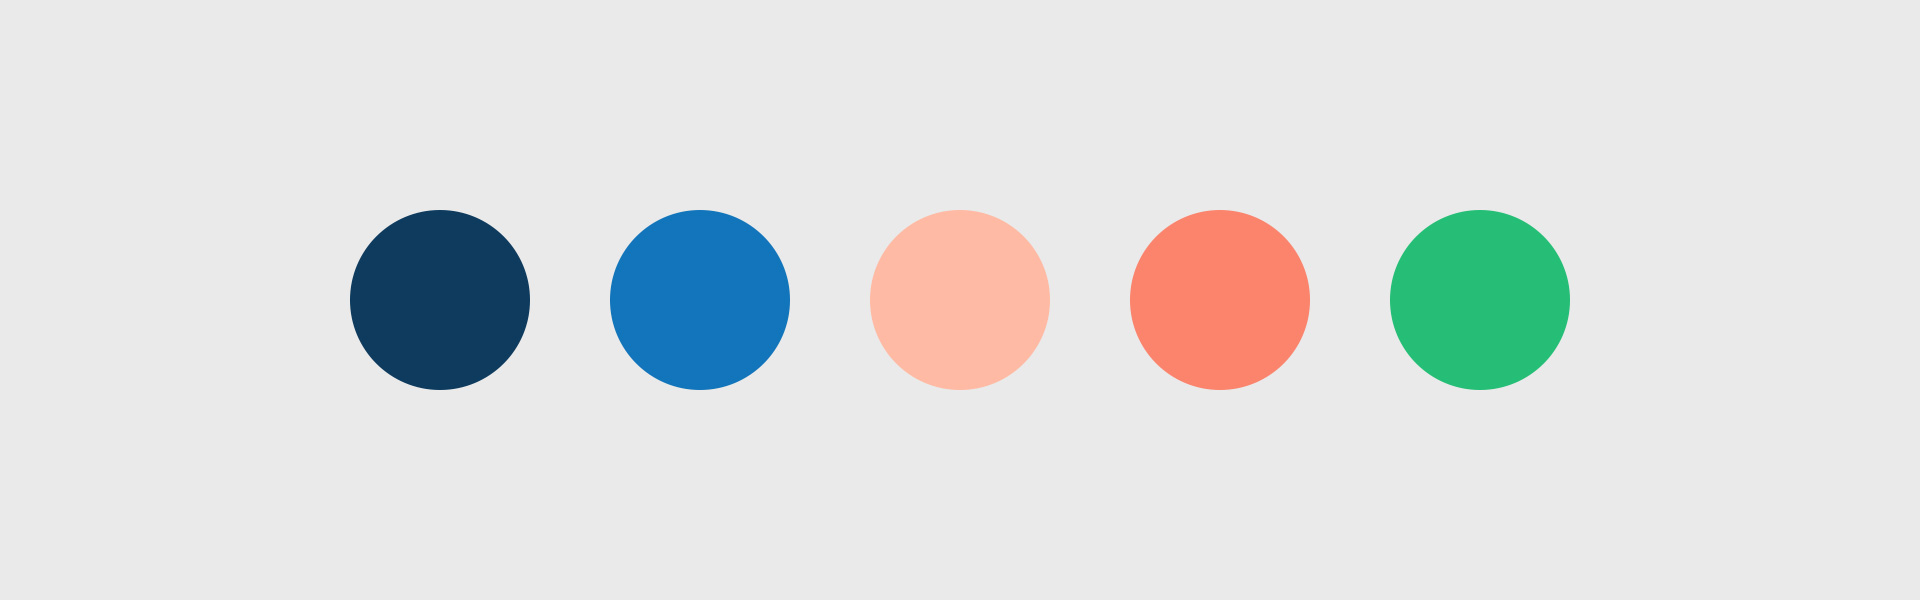 helene-chataigner-aktie-identity-color-palette-scheme